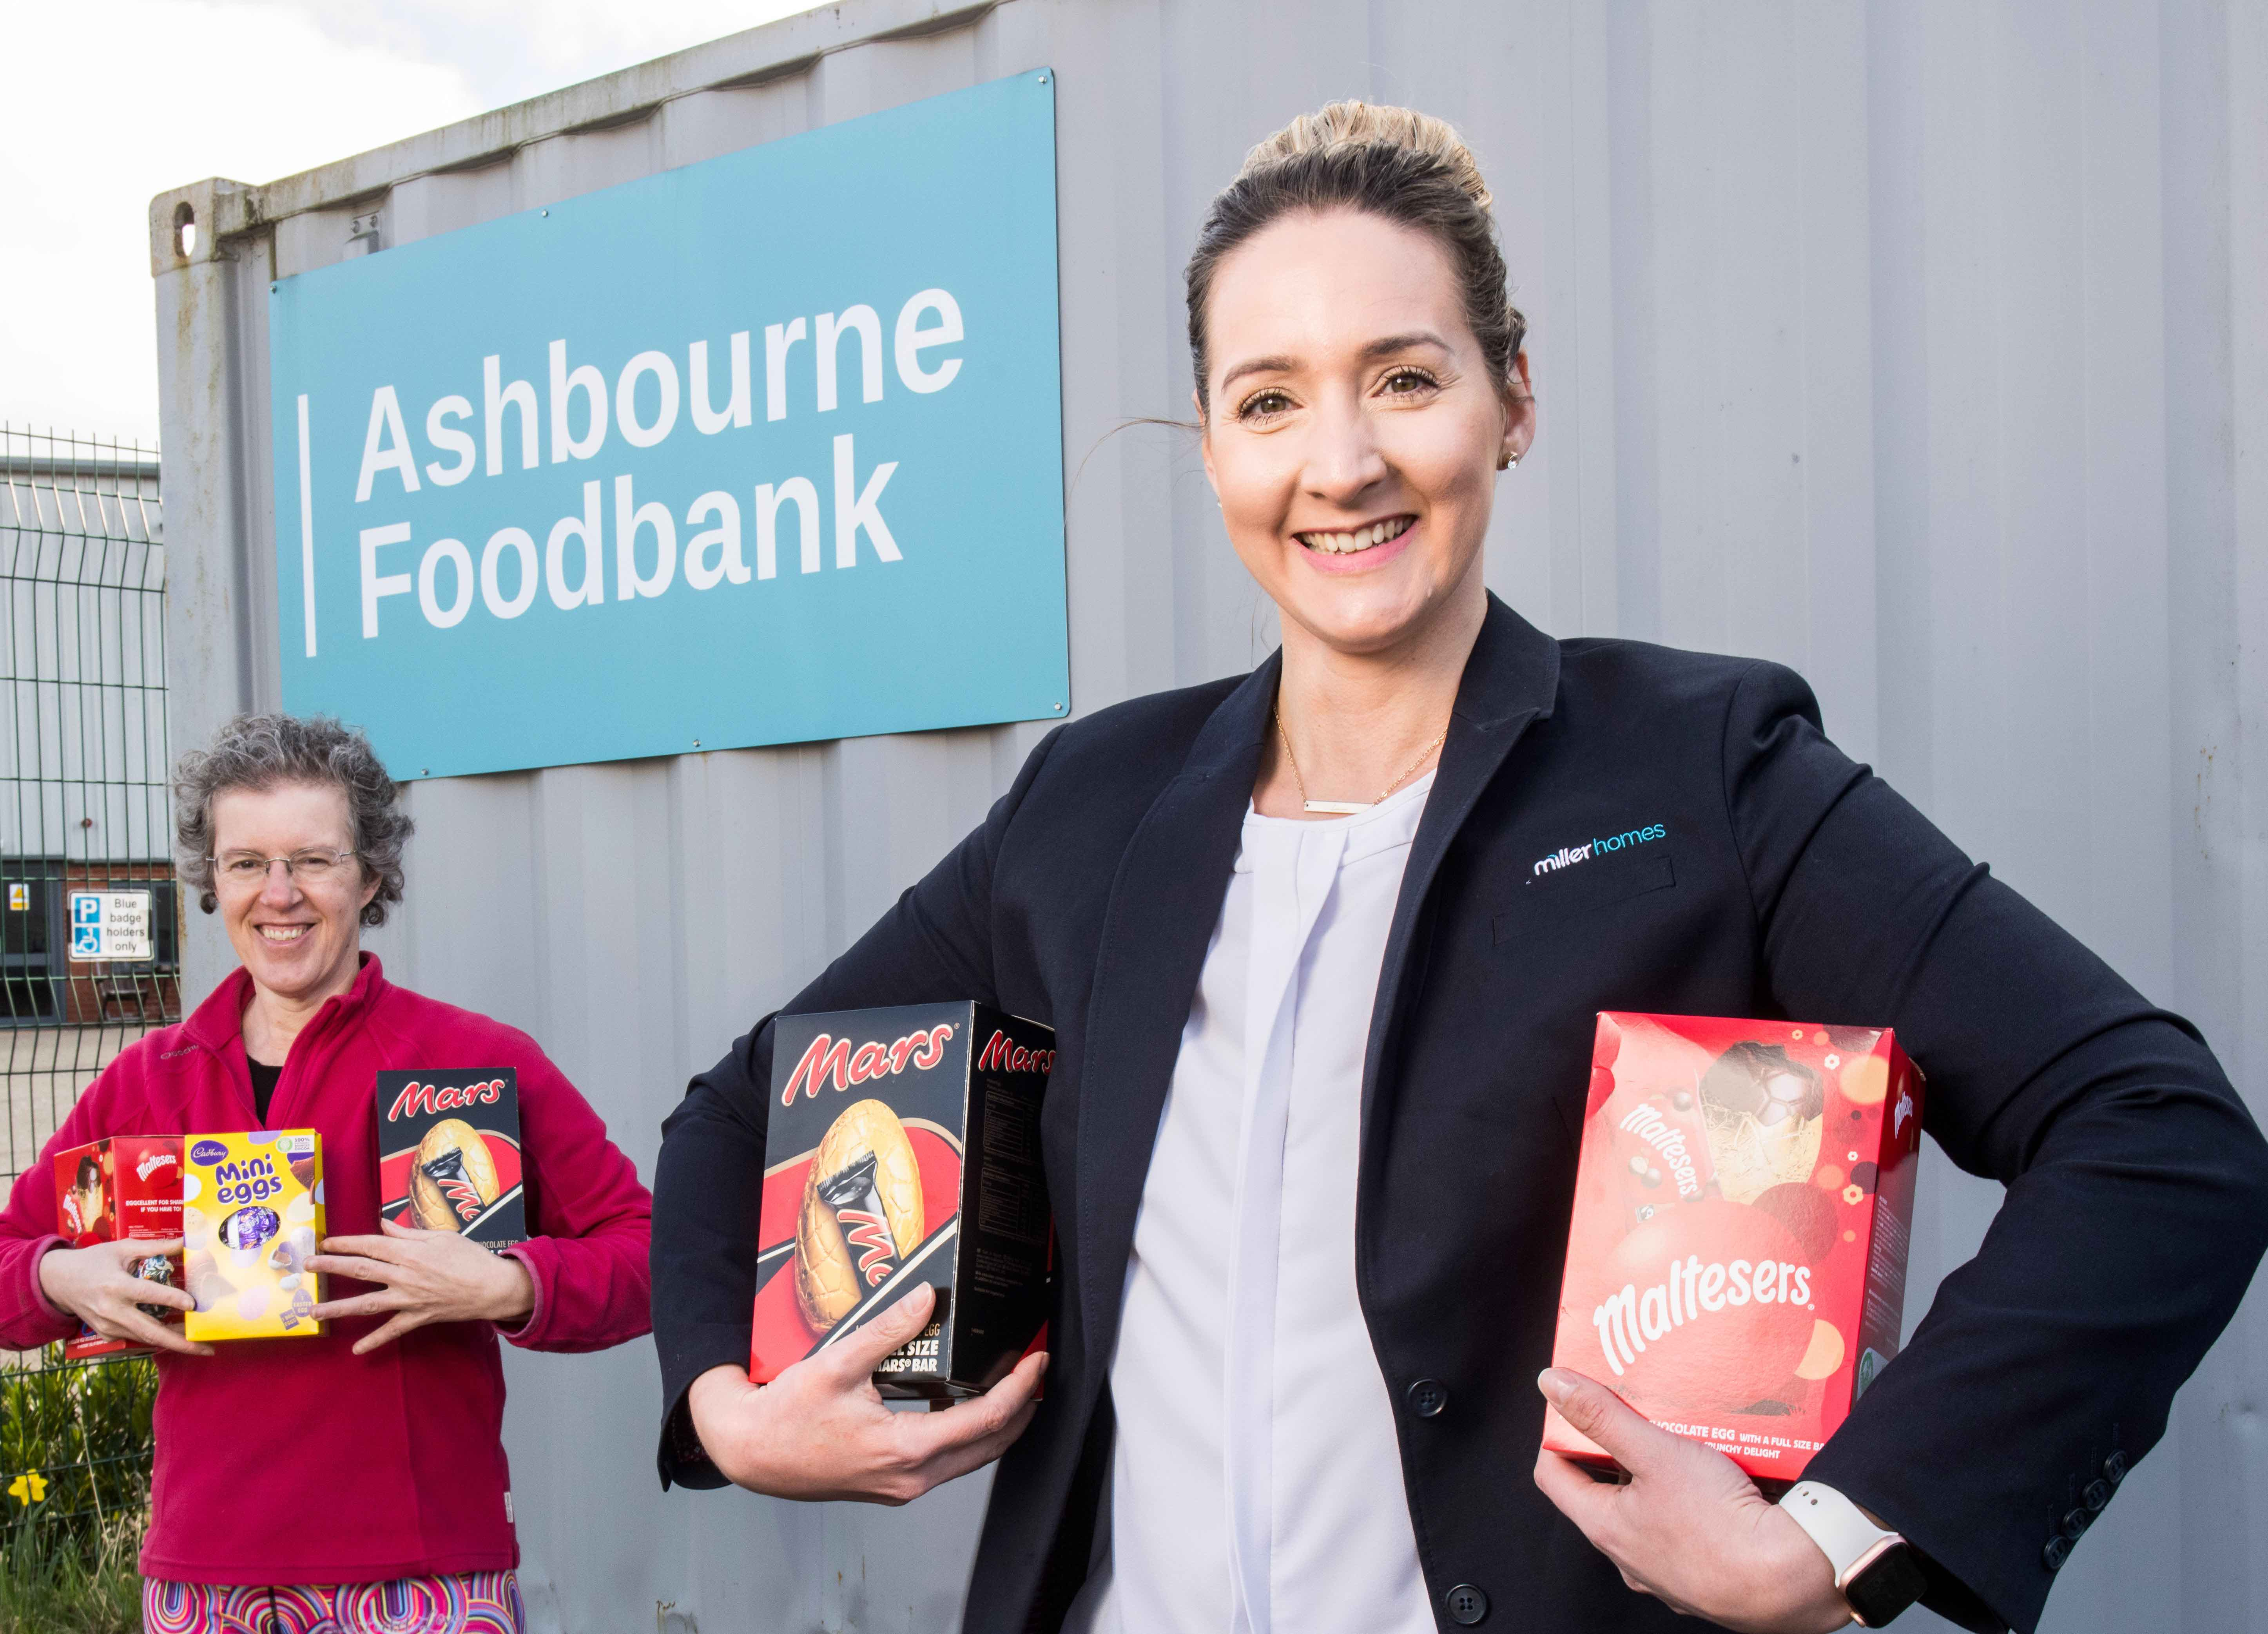 MILLER HOMES MAKES EGG-CELLENT DONATION TO THE ASHBOURNE FOOD BANK